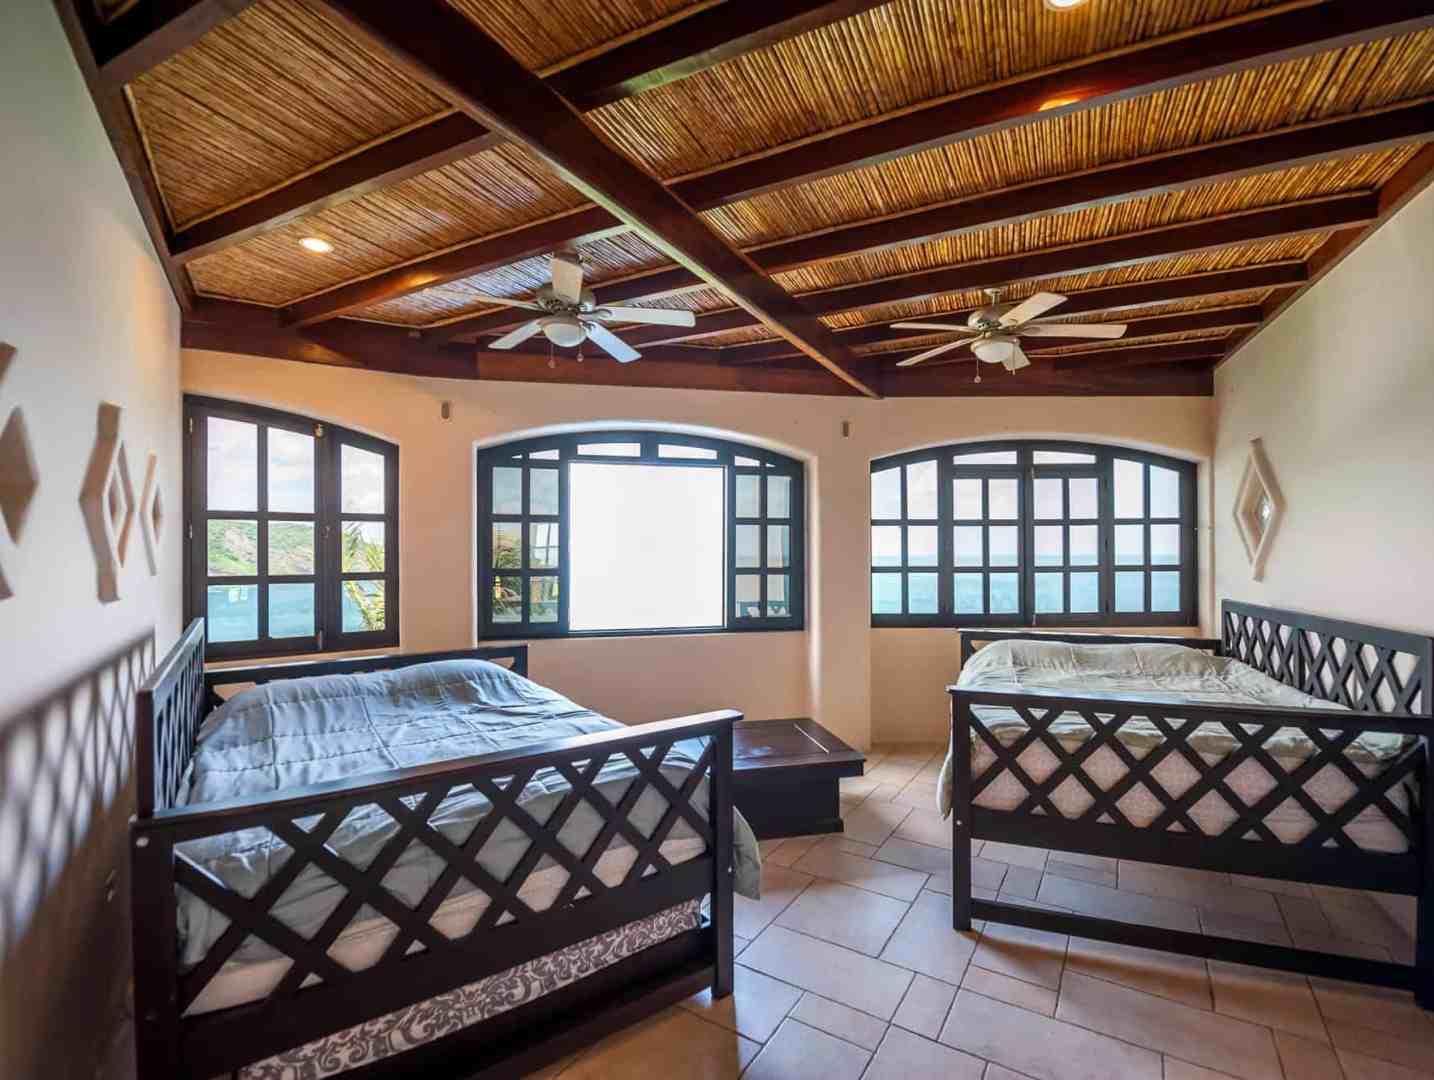 Queen beds in fourth bedroom